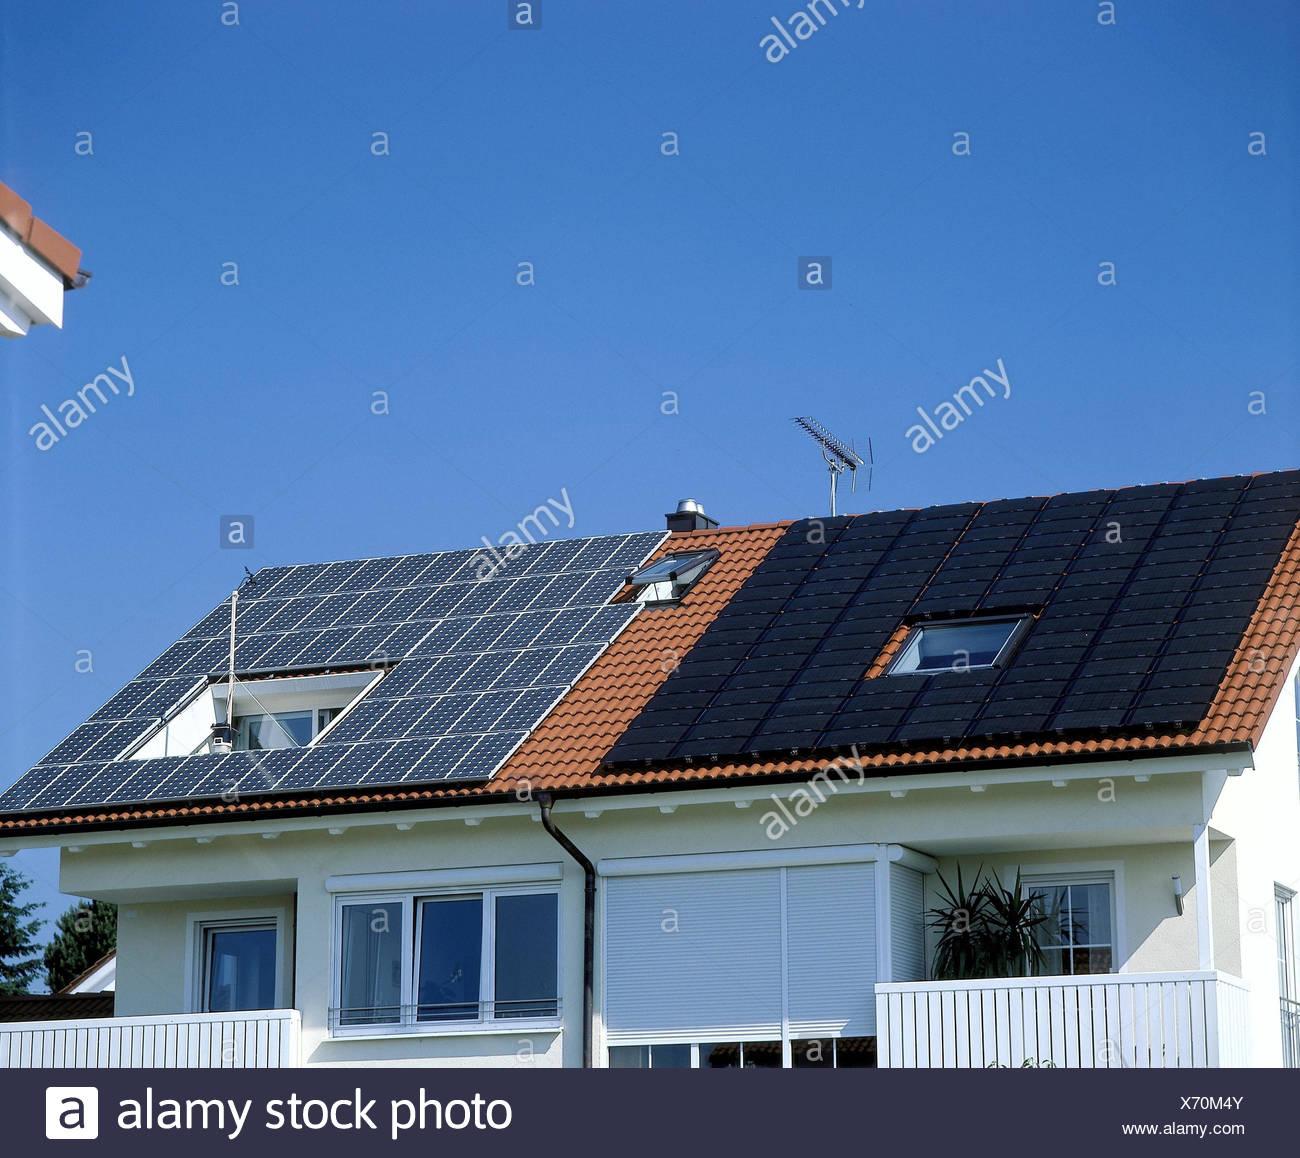 Germany, house roof, solar energy, solar panels on the left, solar cells on the right, house, residential house, own home, power production, detail, roof, solar plant, solar energy, Heliotechnik, alternative energy, alternative energy, energy production, - Stock Image